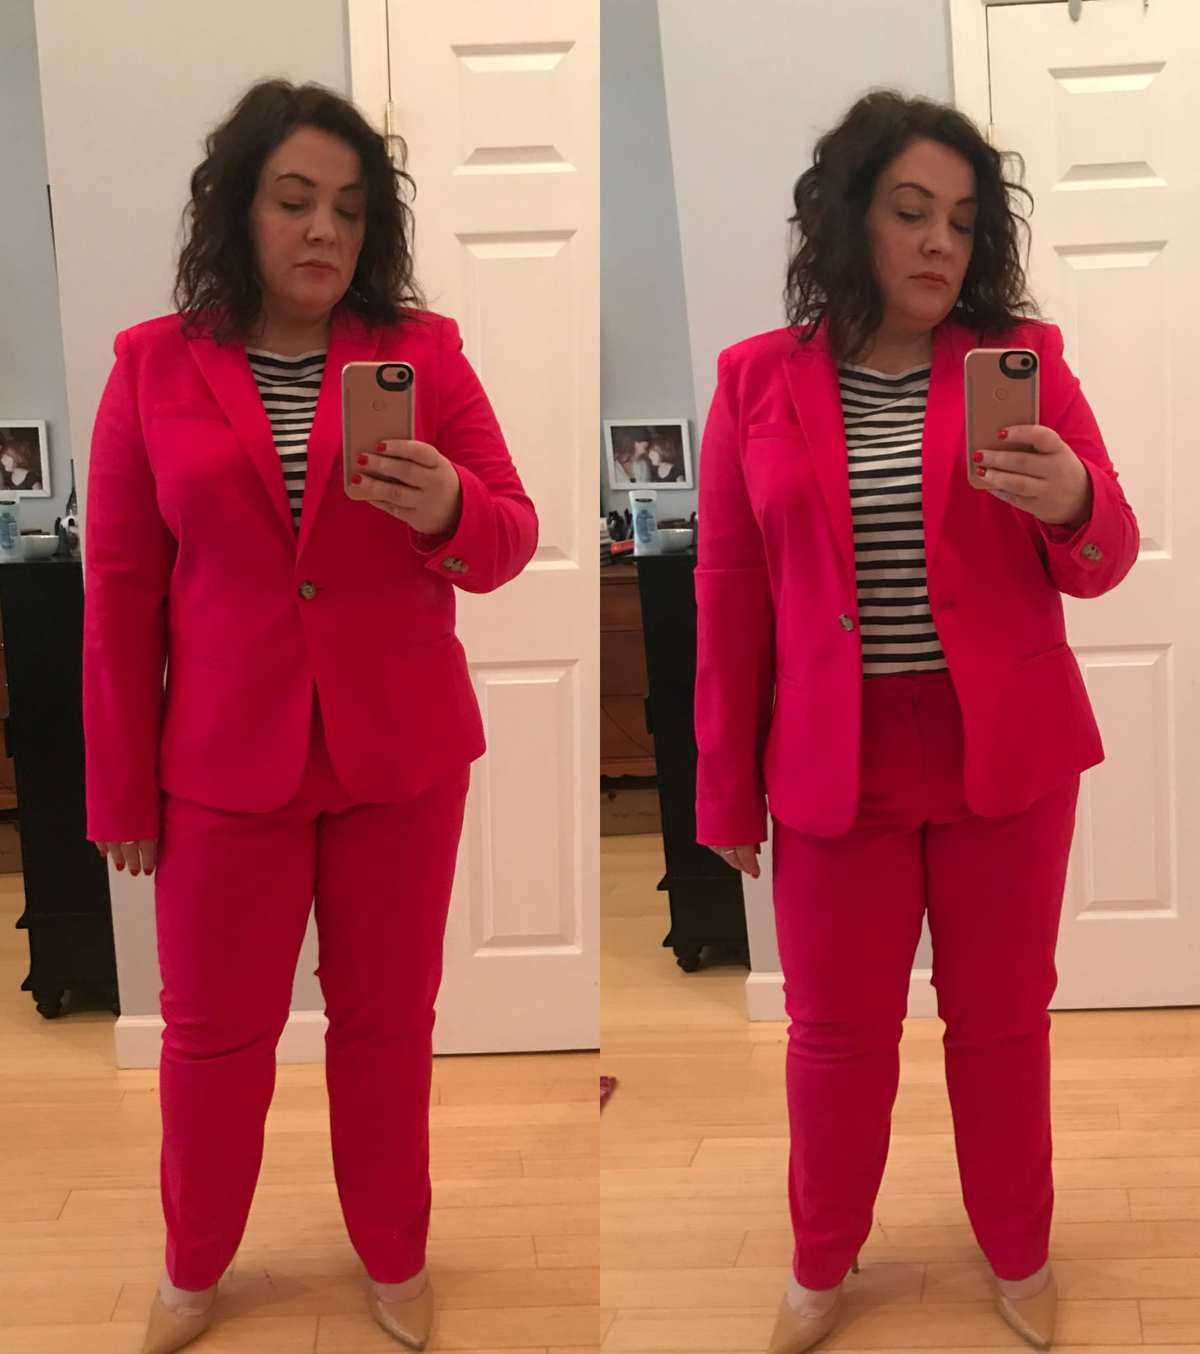 Wardrobe Oxygen - Banana Republic Pink Pantsuit Review